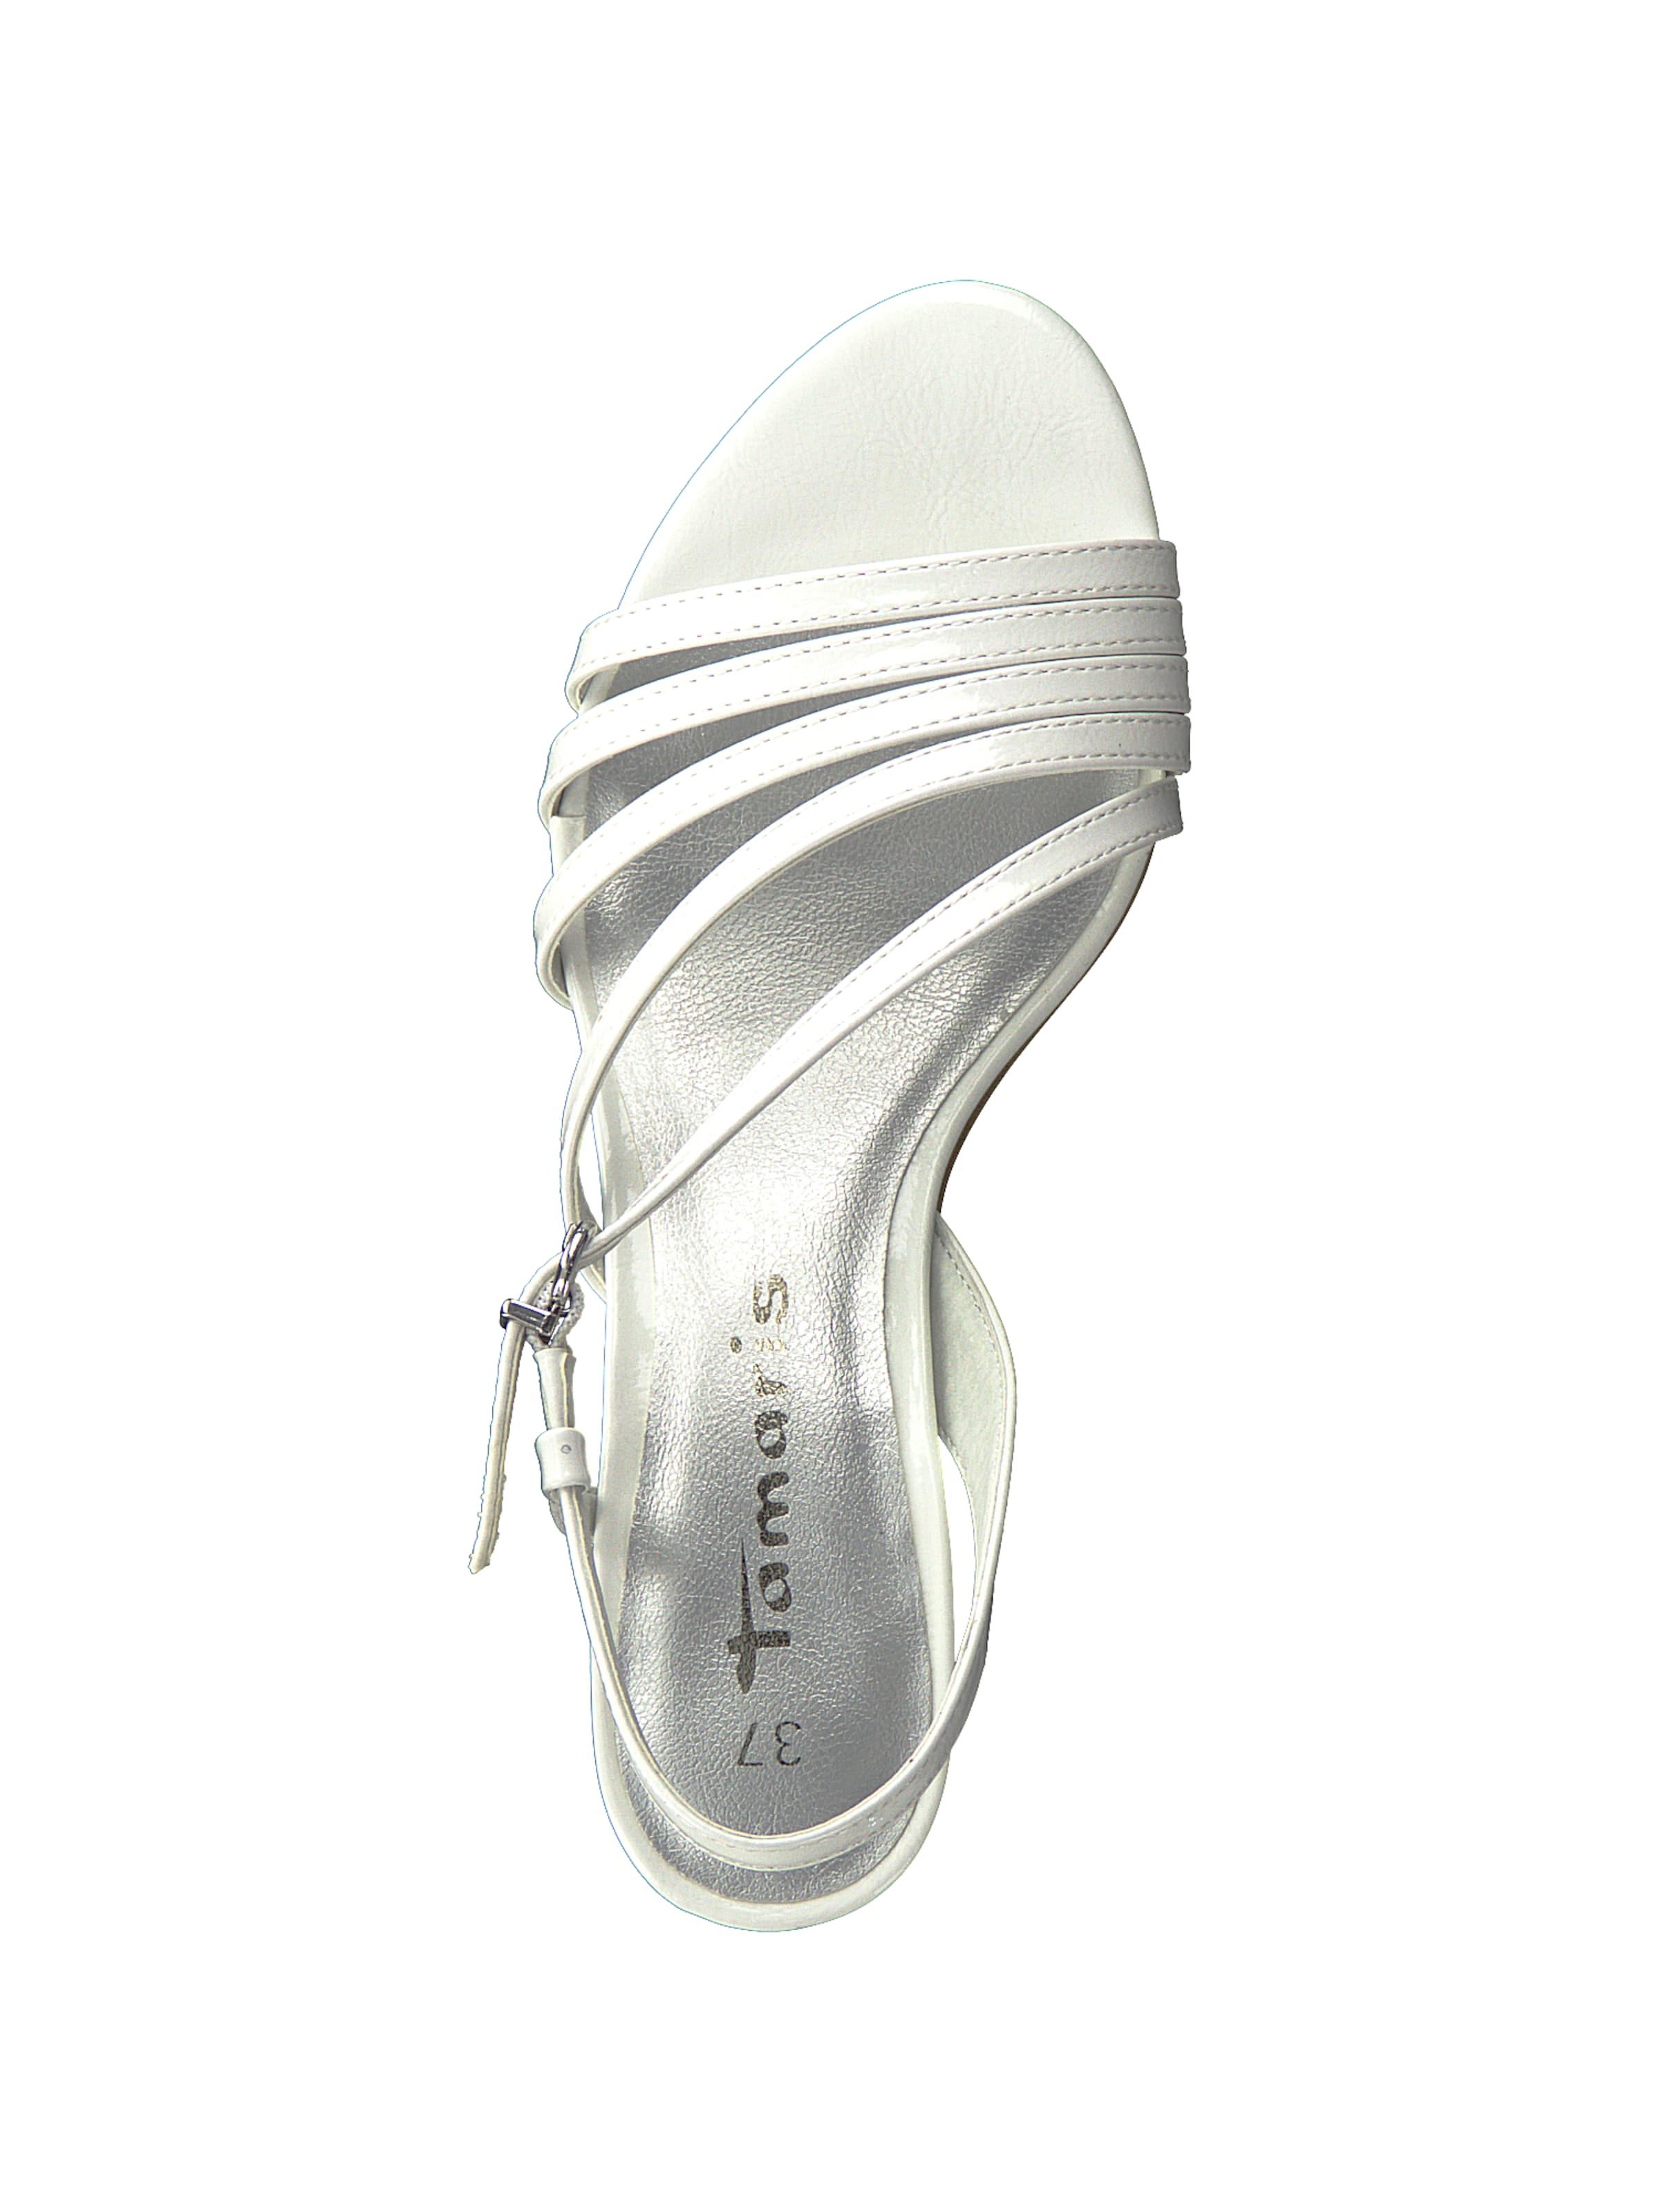 In Tamaris In In Tamaris Sandale In Tamaris Sandale Tamaris Sandale Weiß Sandale Weiß Weiß xBdoQrCeWE